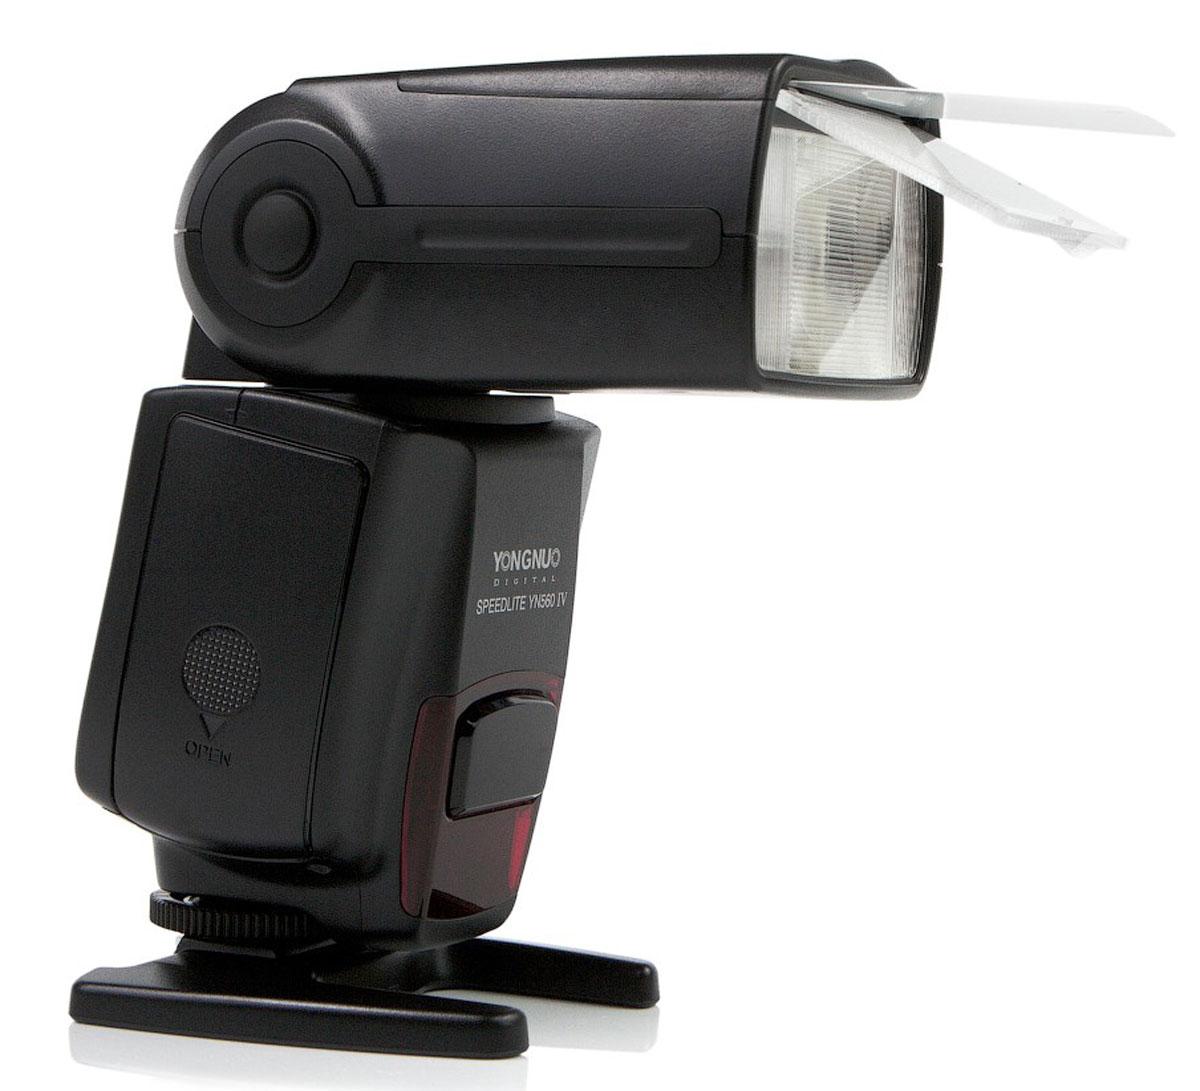 YongNuo Speedlite YN-560IV вспышка со встроенным радиосинхронизатором для Canon, Nikon, Pentax, Olympus, Sony yongnuo i ttl flash speedlite yn 565ex yn565ex speedlight for nikon d7000 d5100 d5000 d3100 d3000 d700 d300 d300s d200 d90 d80